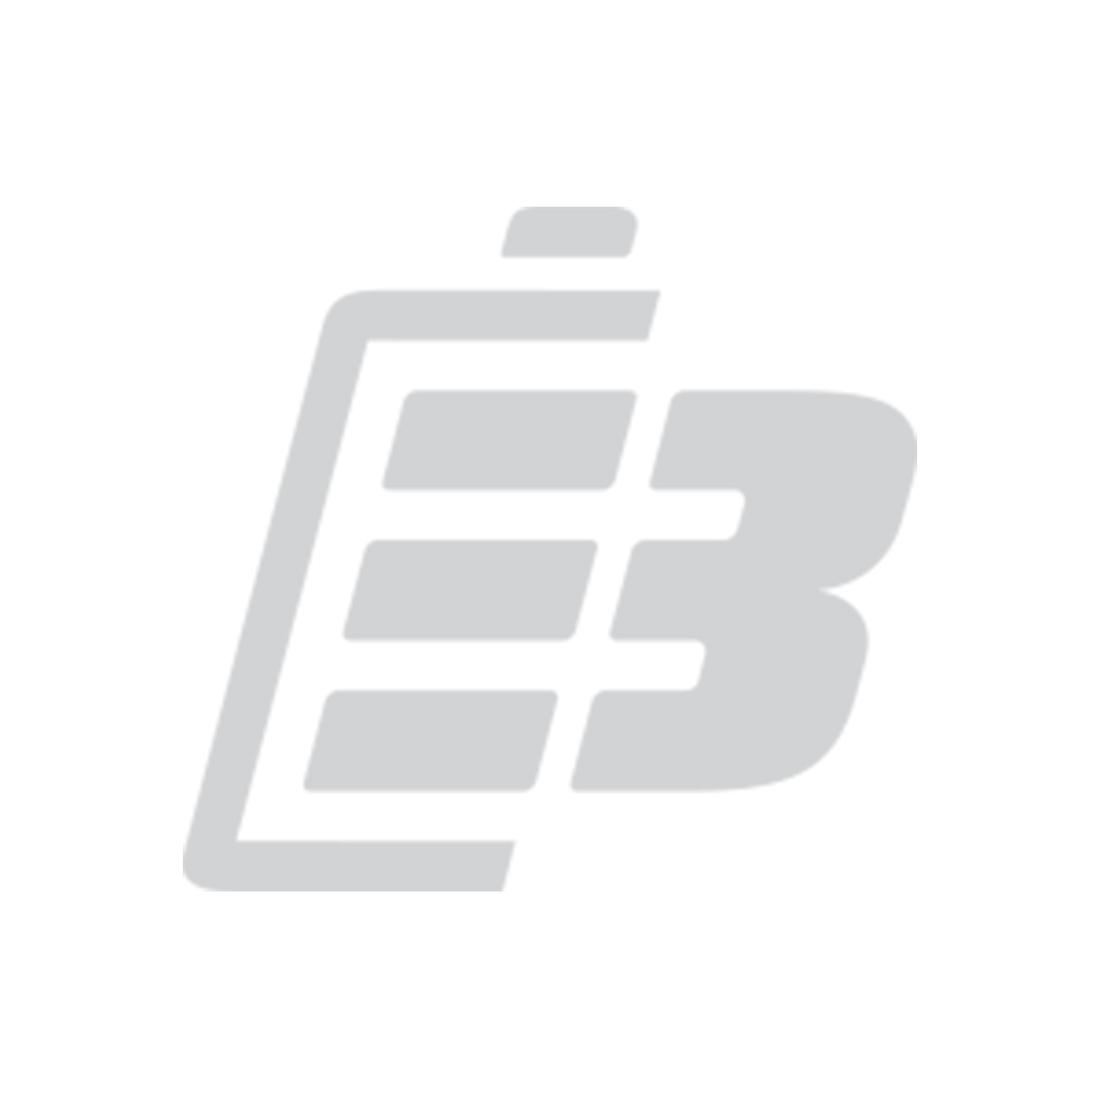 Camcorder battery JVC SSL-JVC50 extended_1